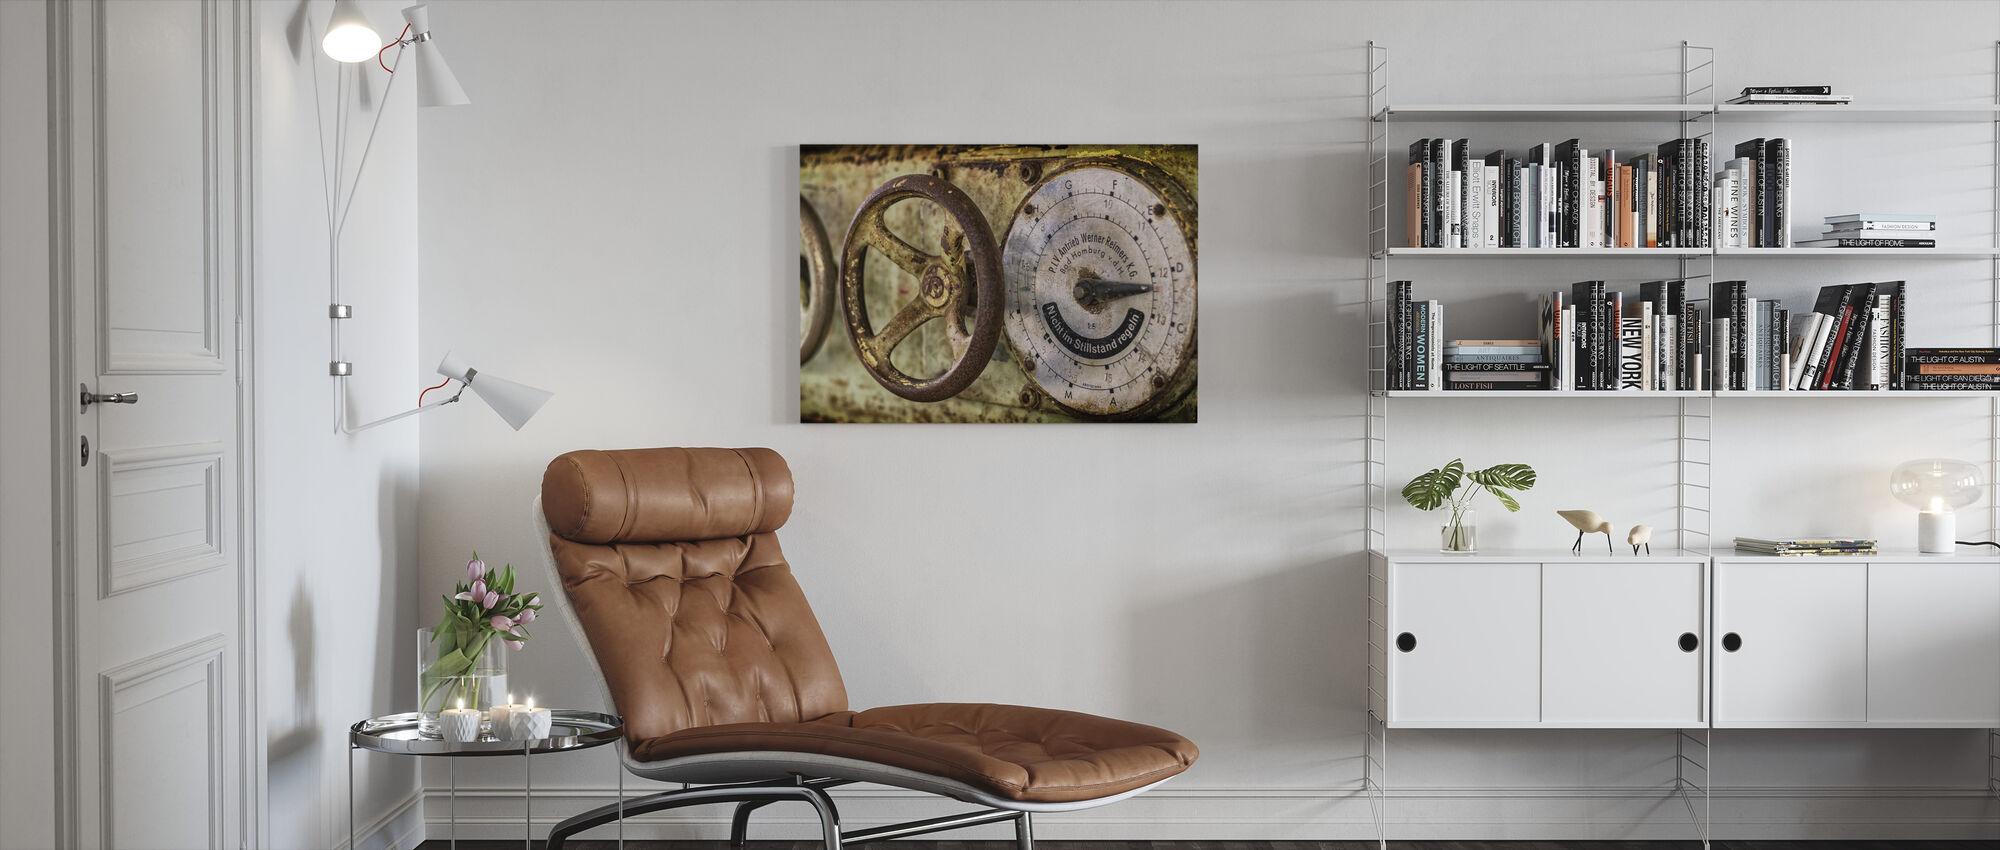 Rusty Gauge and Wheel - Canvas print - Living Room